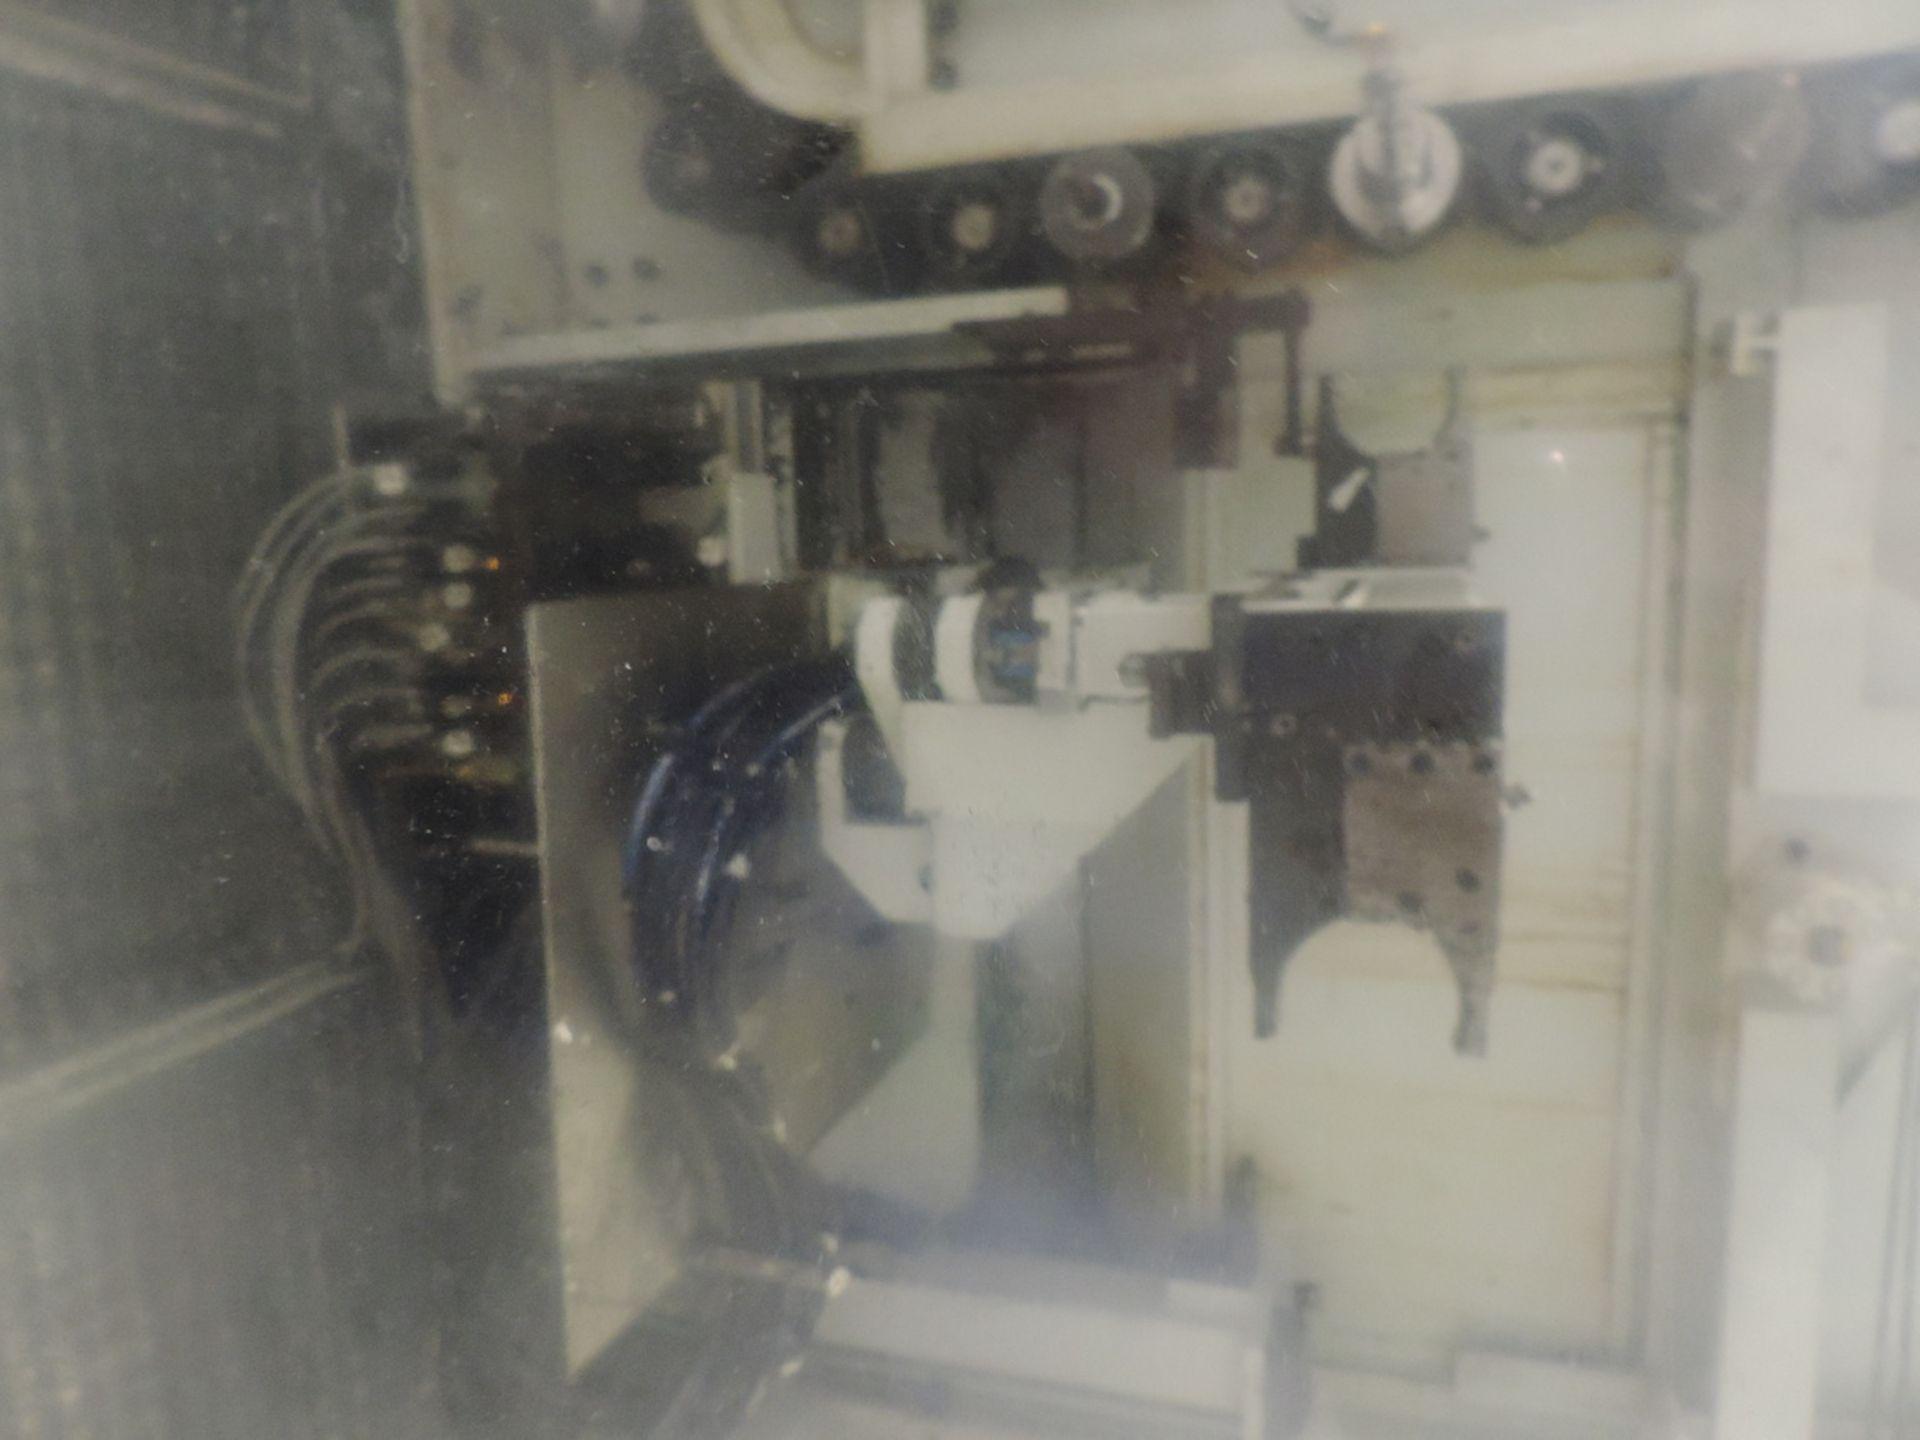 "2002 STARRAG & HECKERT CWK-630D HMC, GE FANUC 16i-M CONTROL, XYZ TRAVELS: 41"" X 39"" X 45"", 24.8"" X - Image 17 of 20"